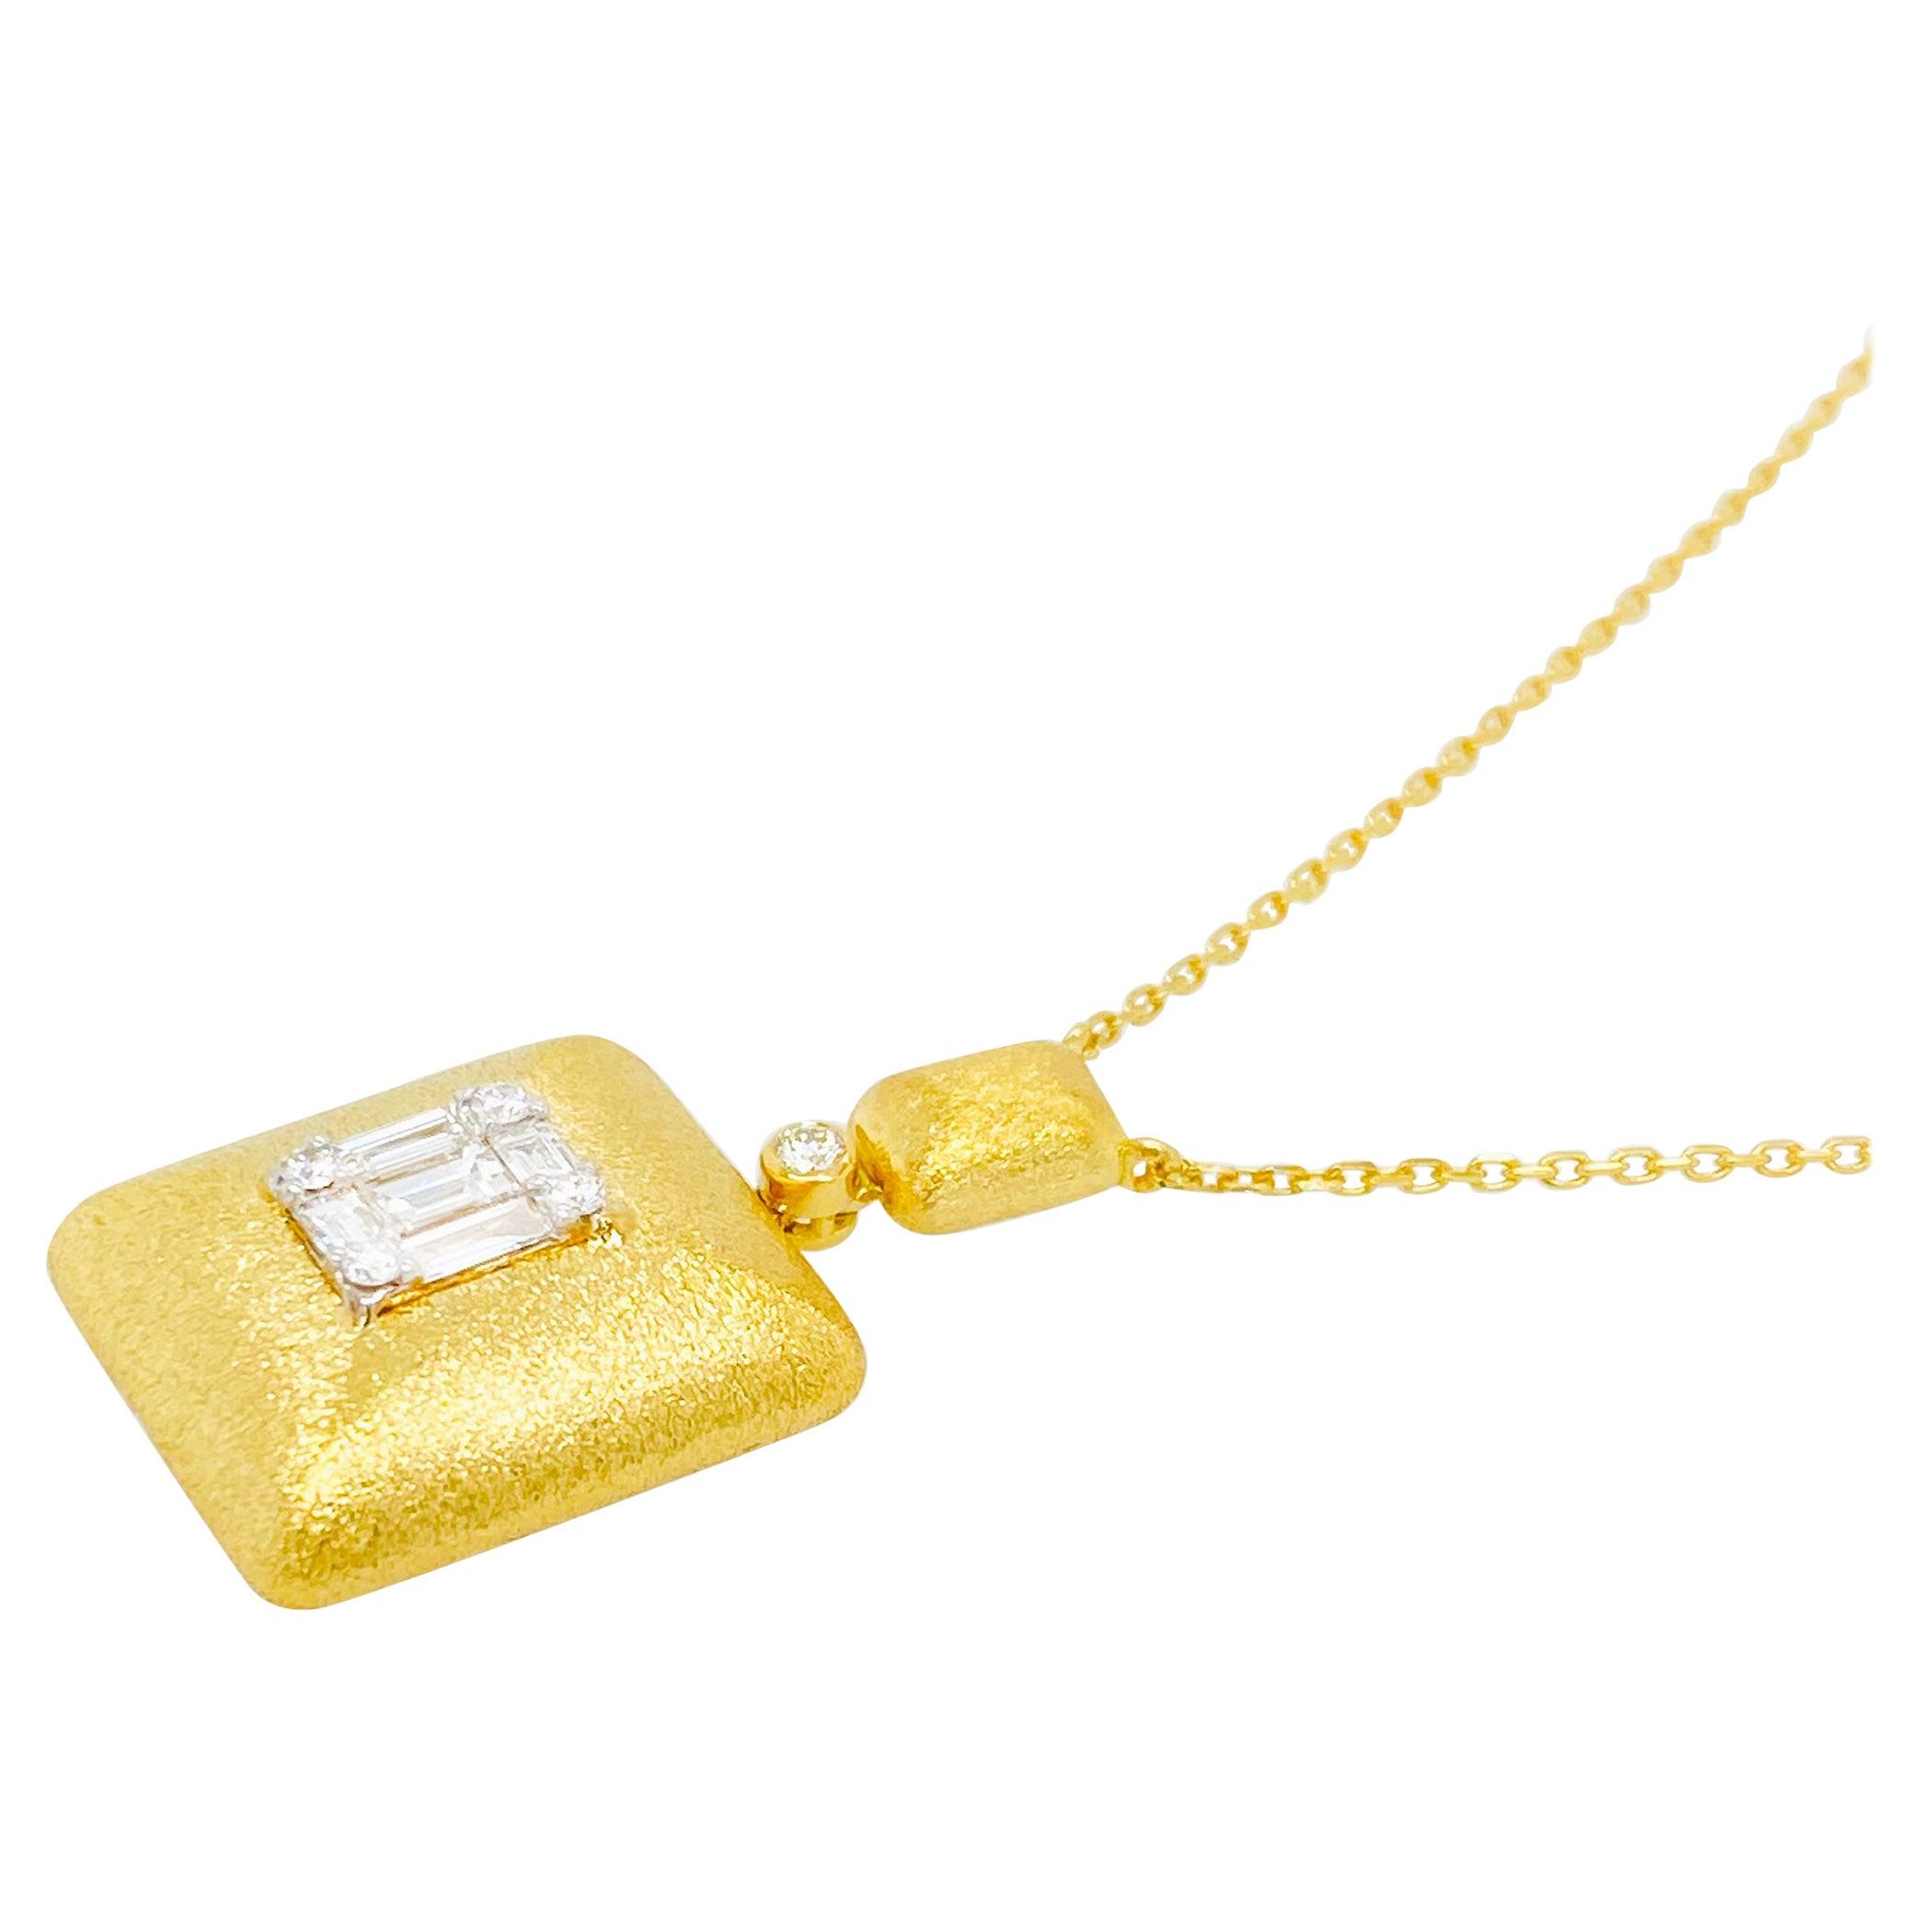 Emerald Illusion Diamond Pendant Necklace 18 Karat Yellow Gold